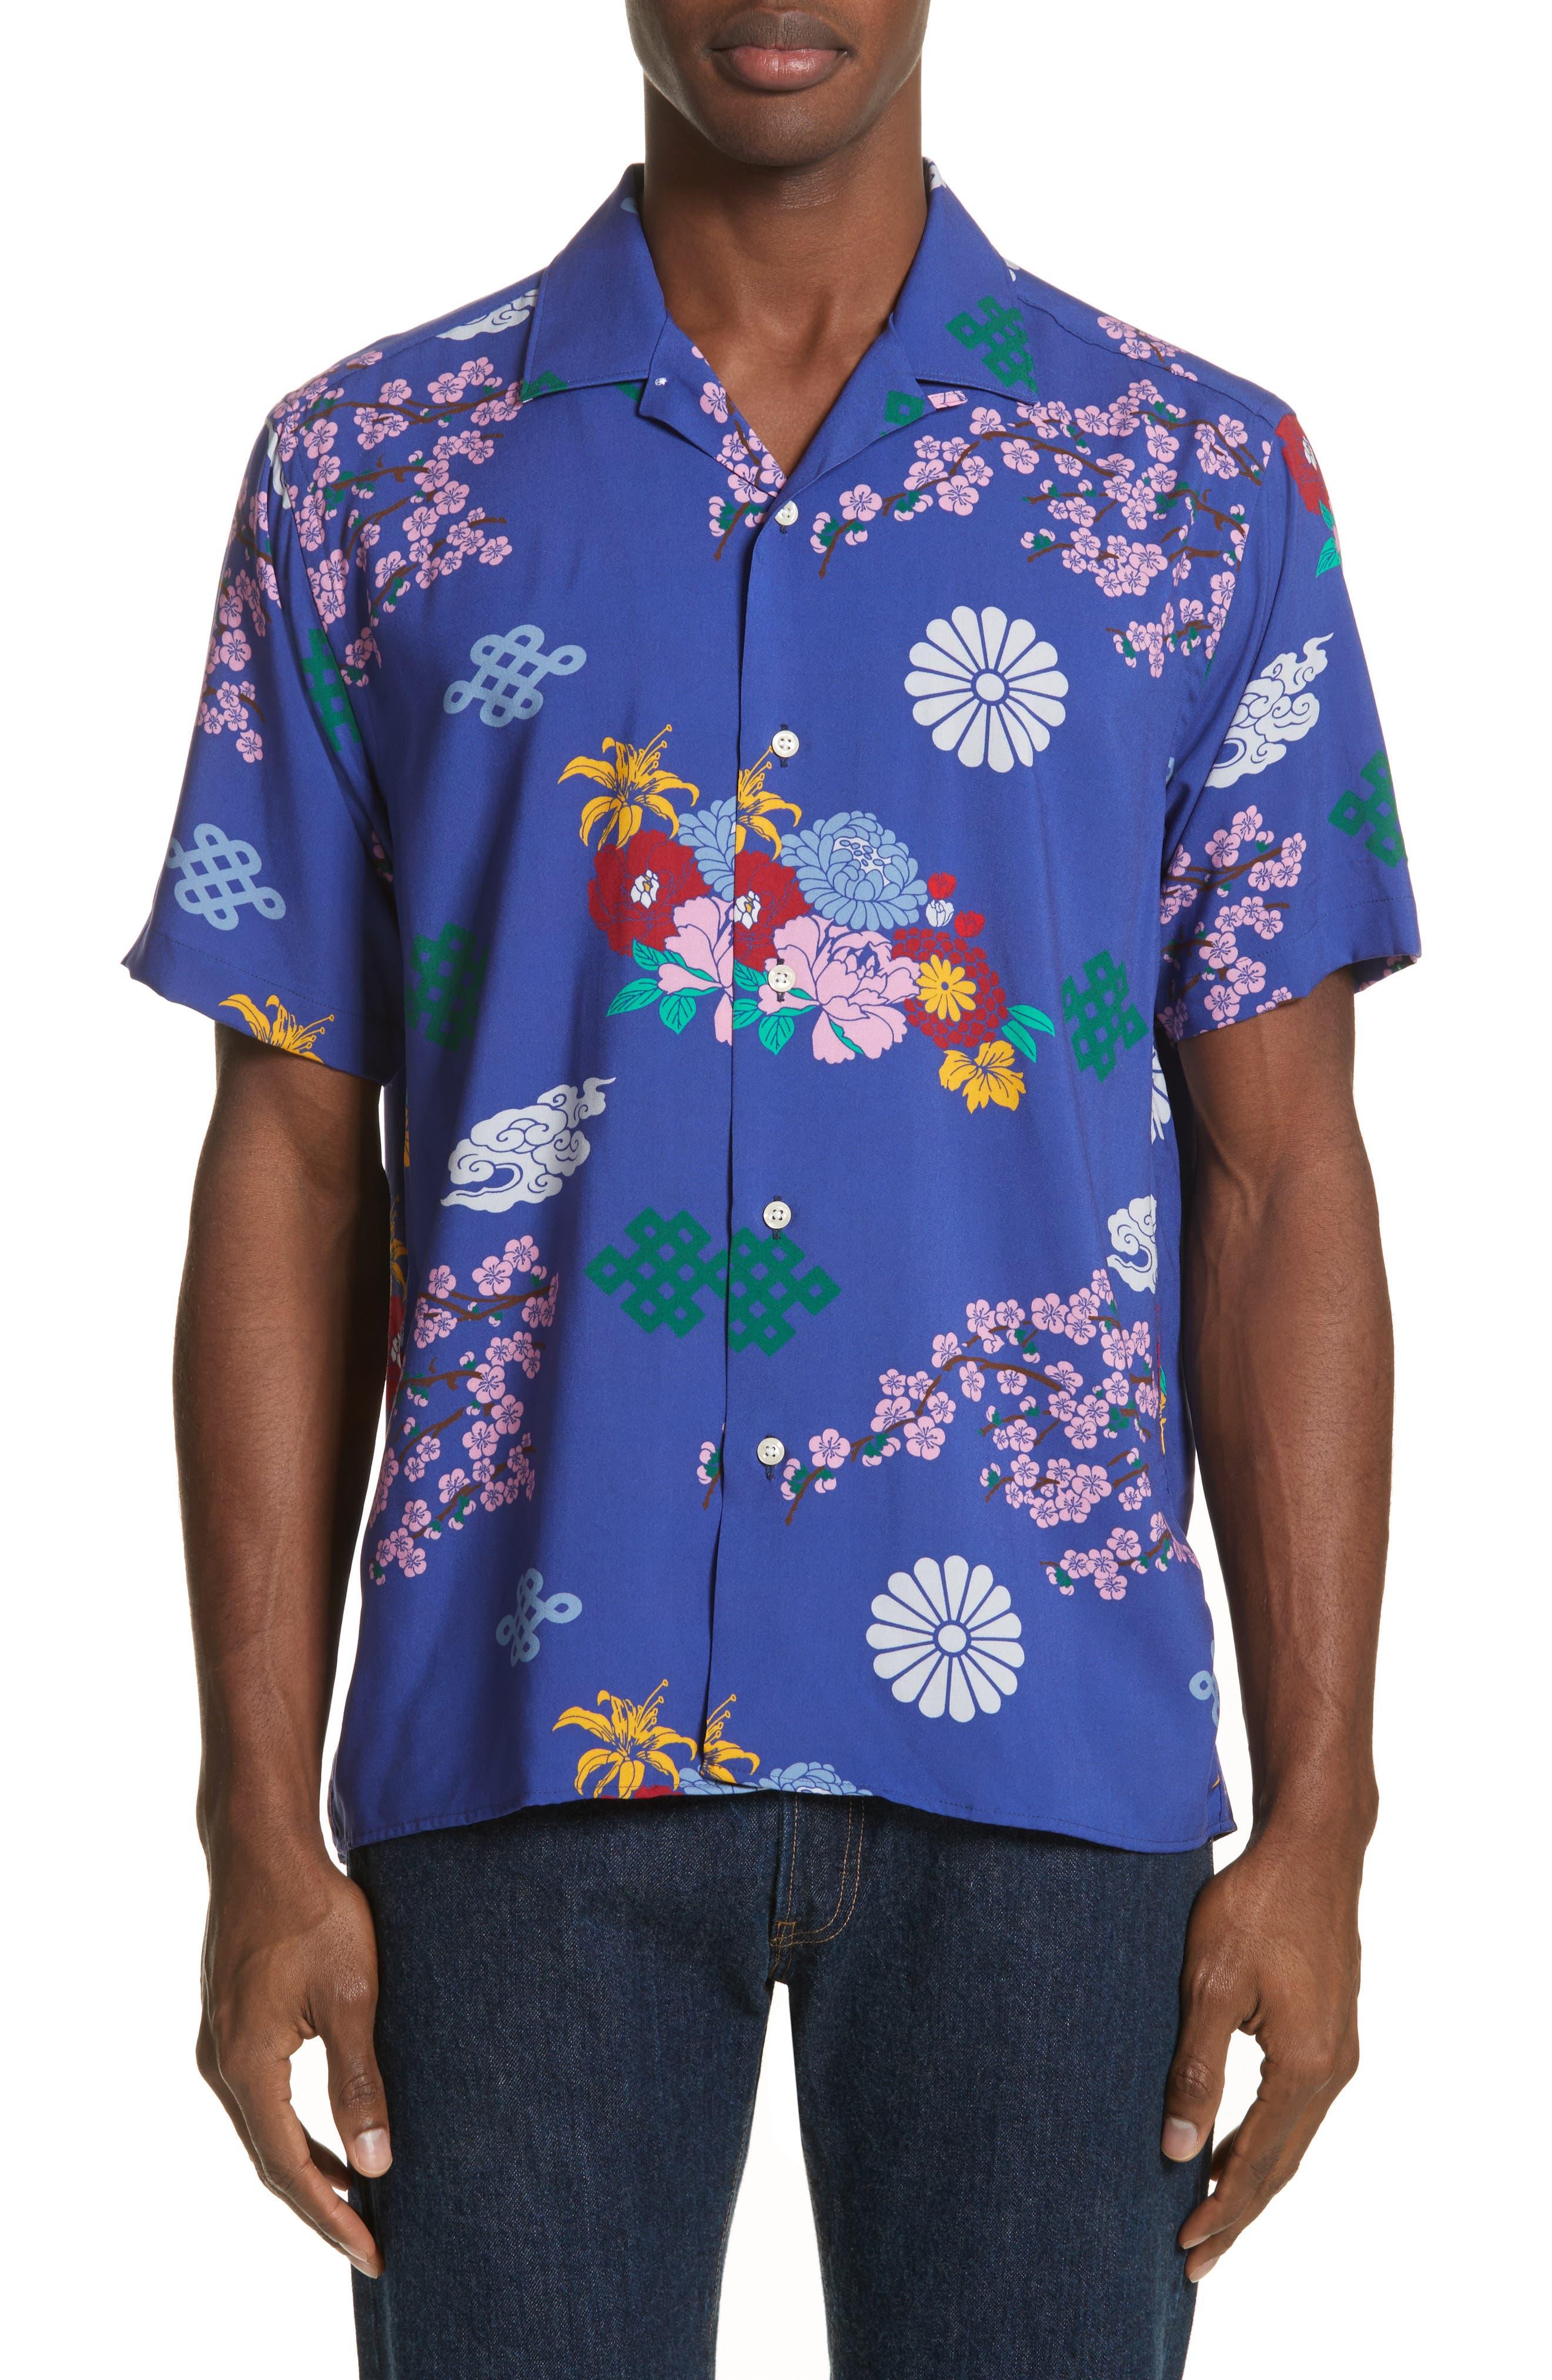 x The North Face Men's Floral Print Camp Shirt,                             Alternate thumbnail 2, color,                             400